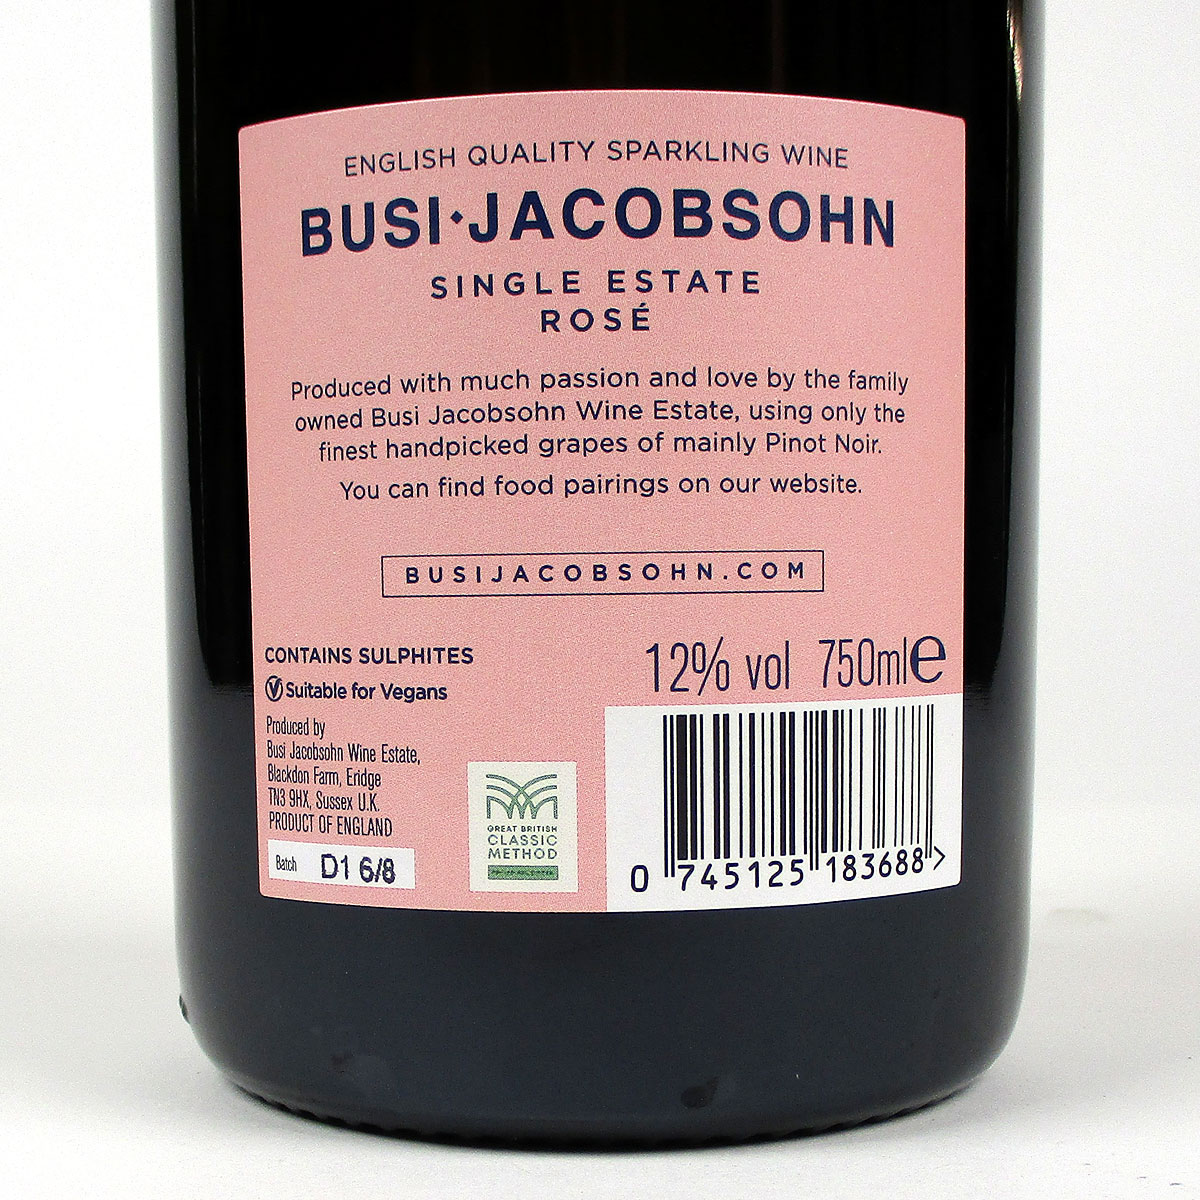 Busi Jacobsohn: Rosé 2018 - Bottle Rear Label